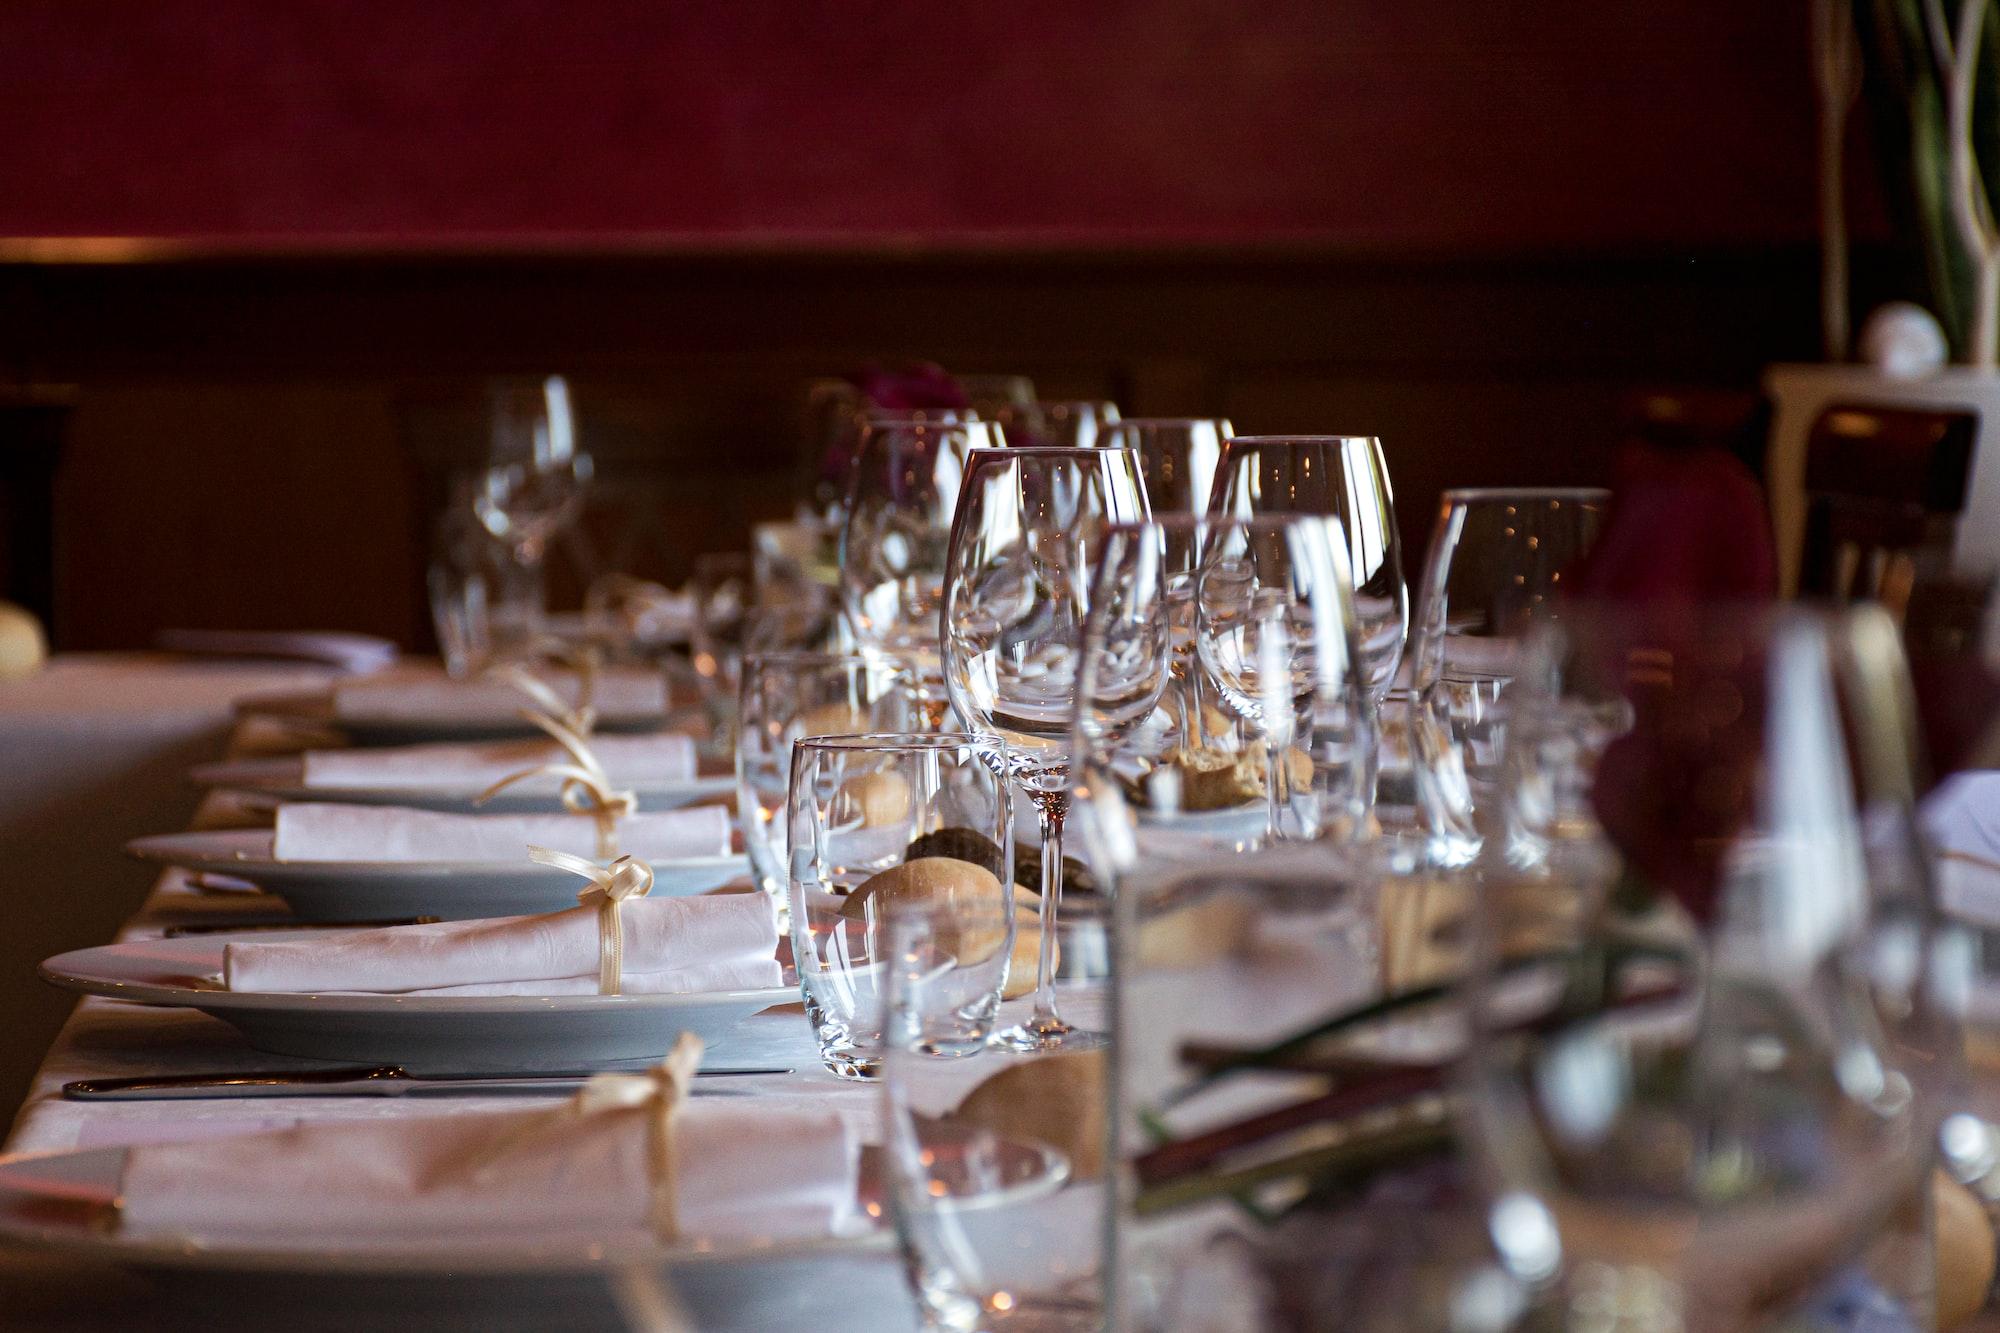 A table set for a wedding dinner.